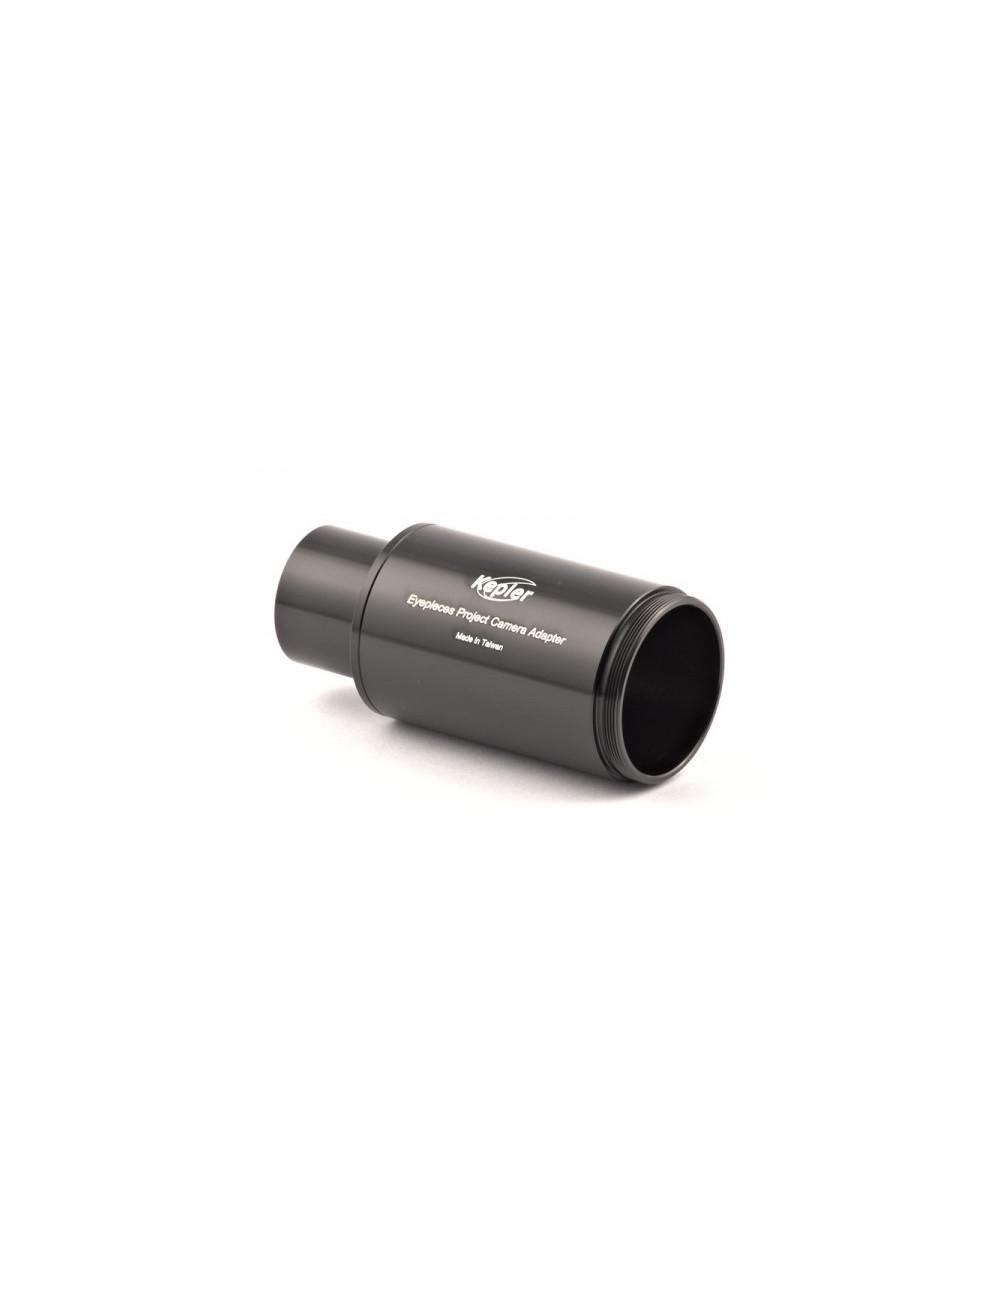 Adaptateur photo. standard Ø 31,75 mm